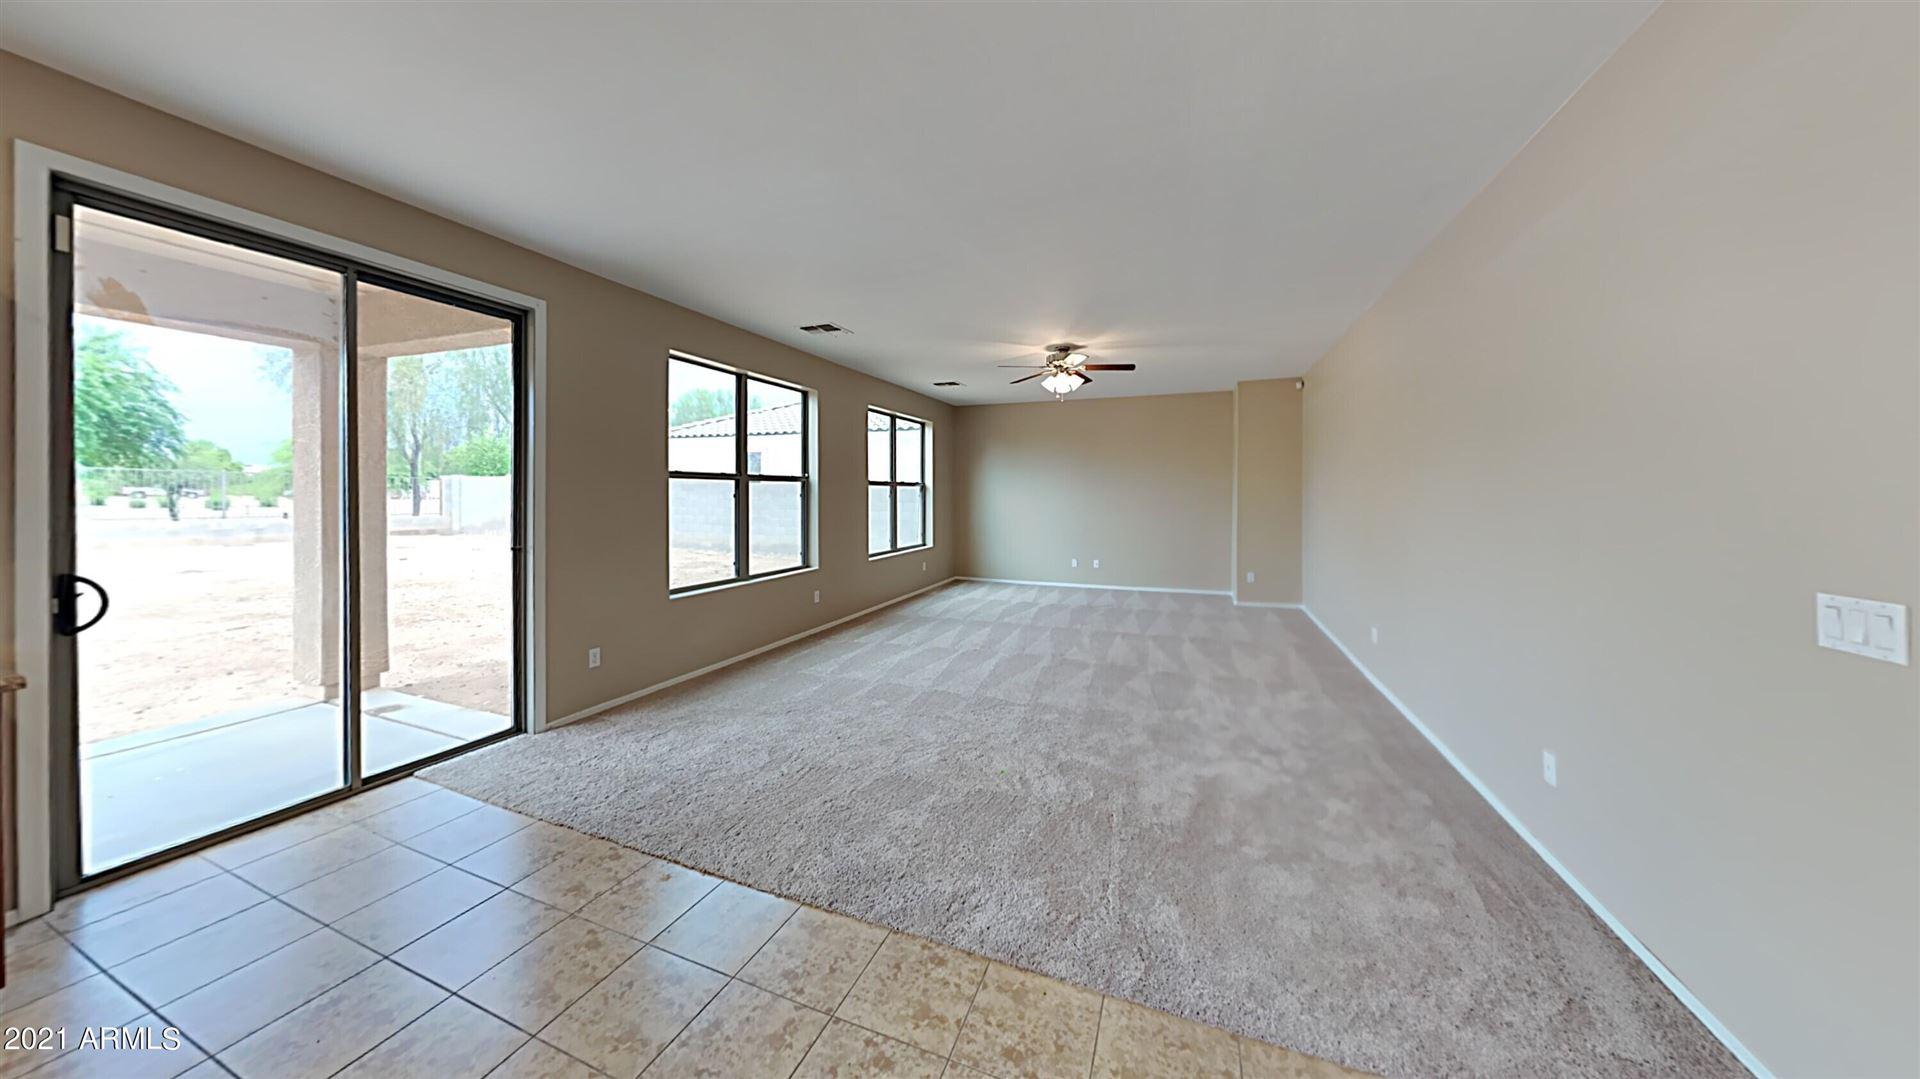 Photo of 10124 W RAYMOND Street, Tolleson, AZ 85353 (MLS # 6270590)